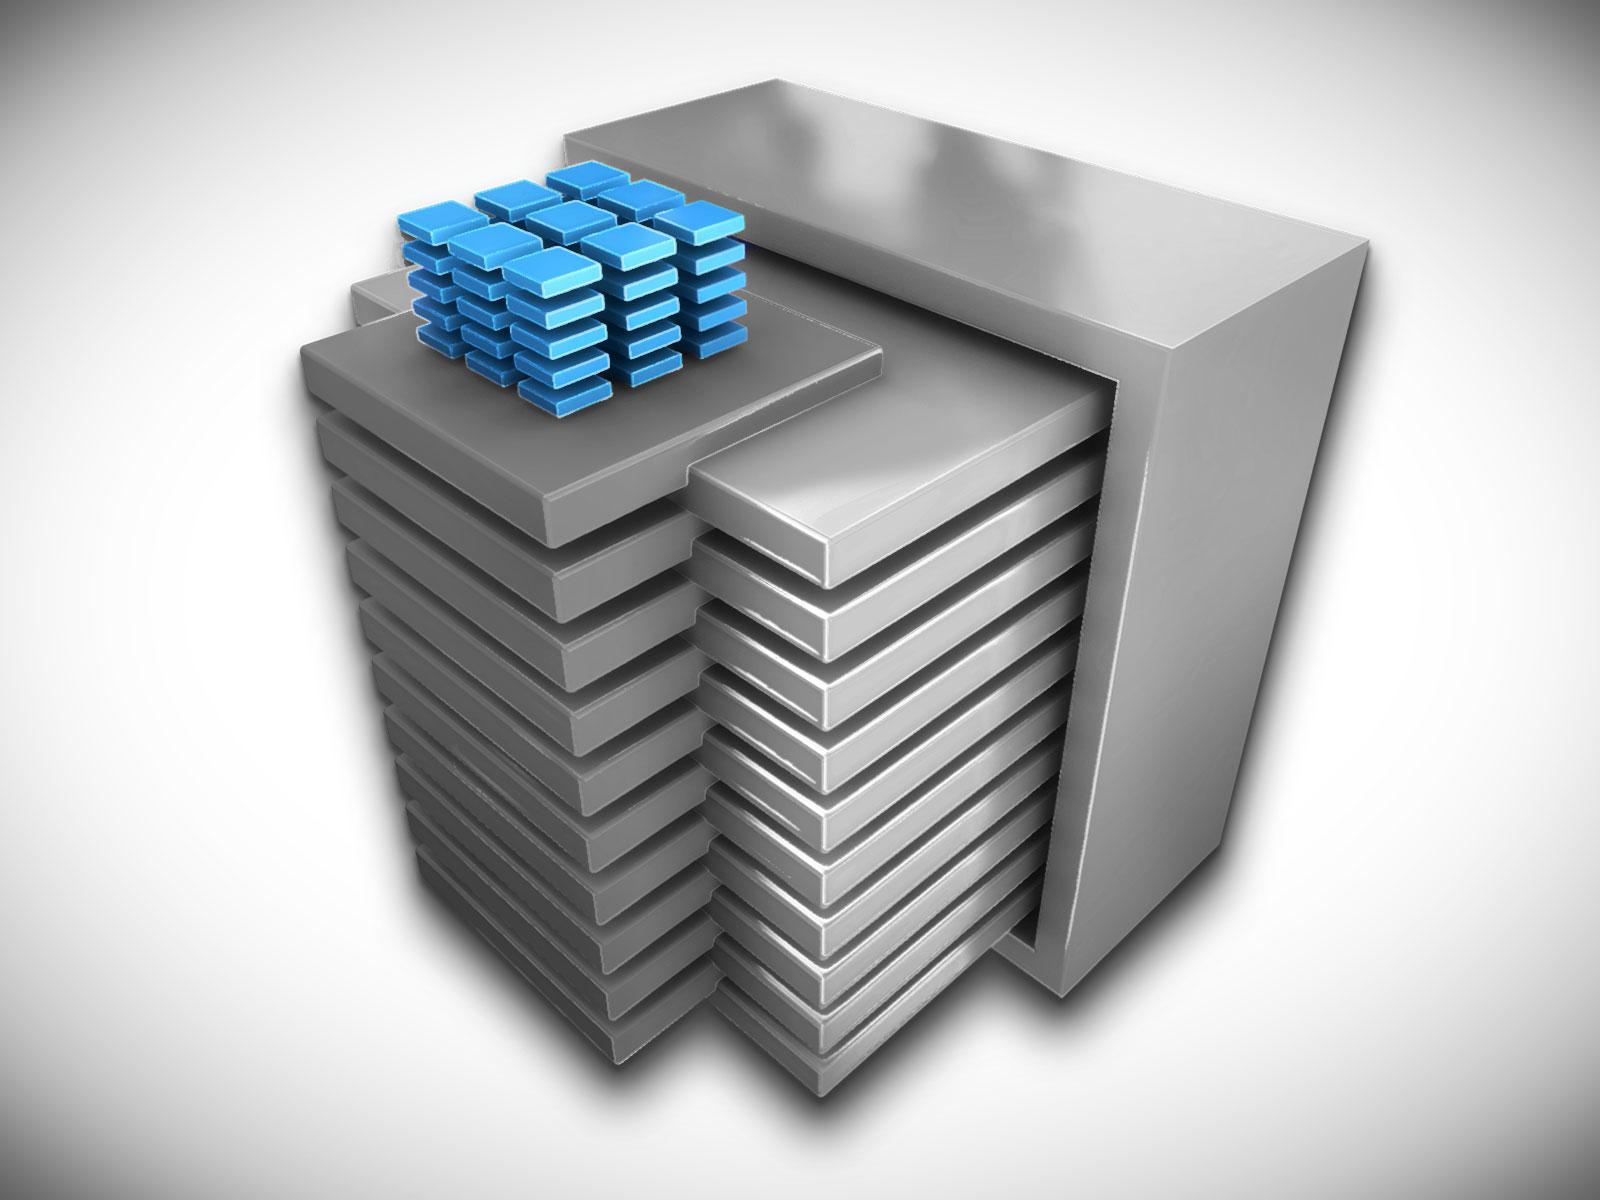 Dataeagle Portal - Operator Level 1, Cloud Deutschland, Device Cloud, Cloud Service, Schildknecht AG; Cloud Dienste